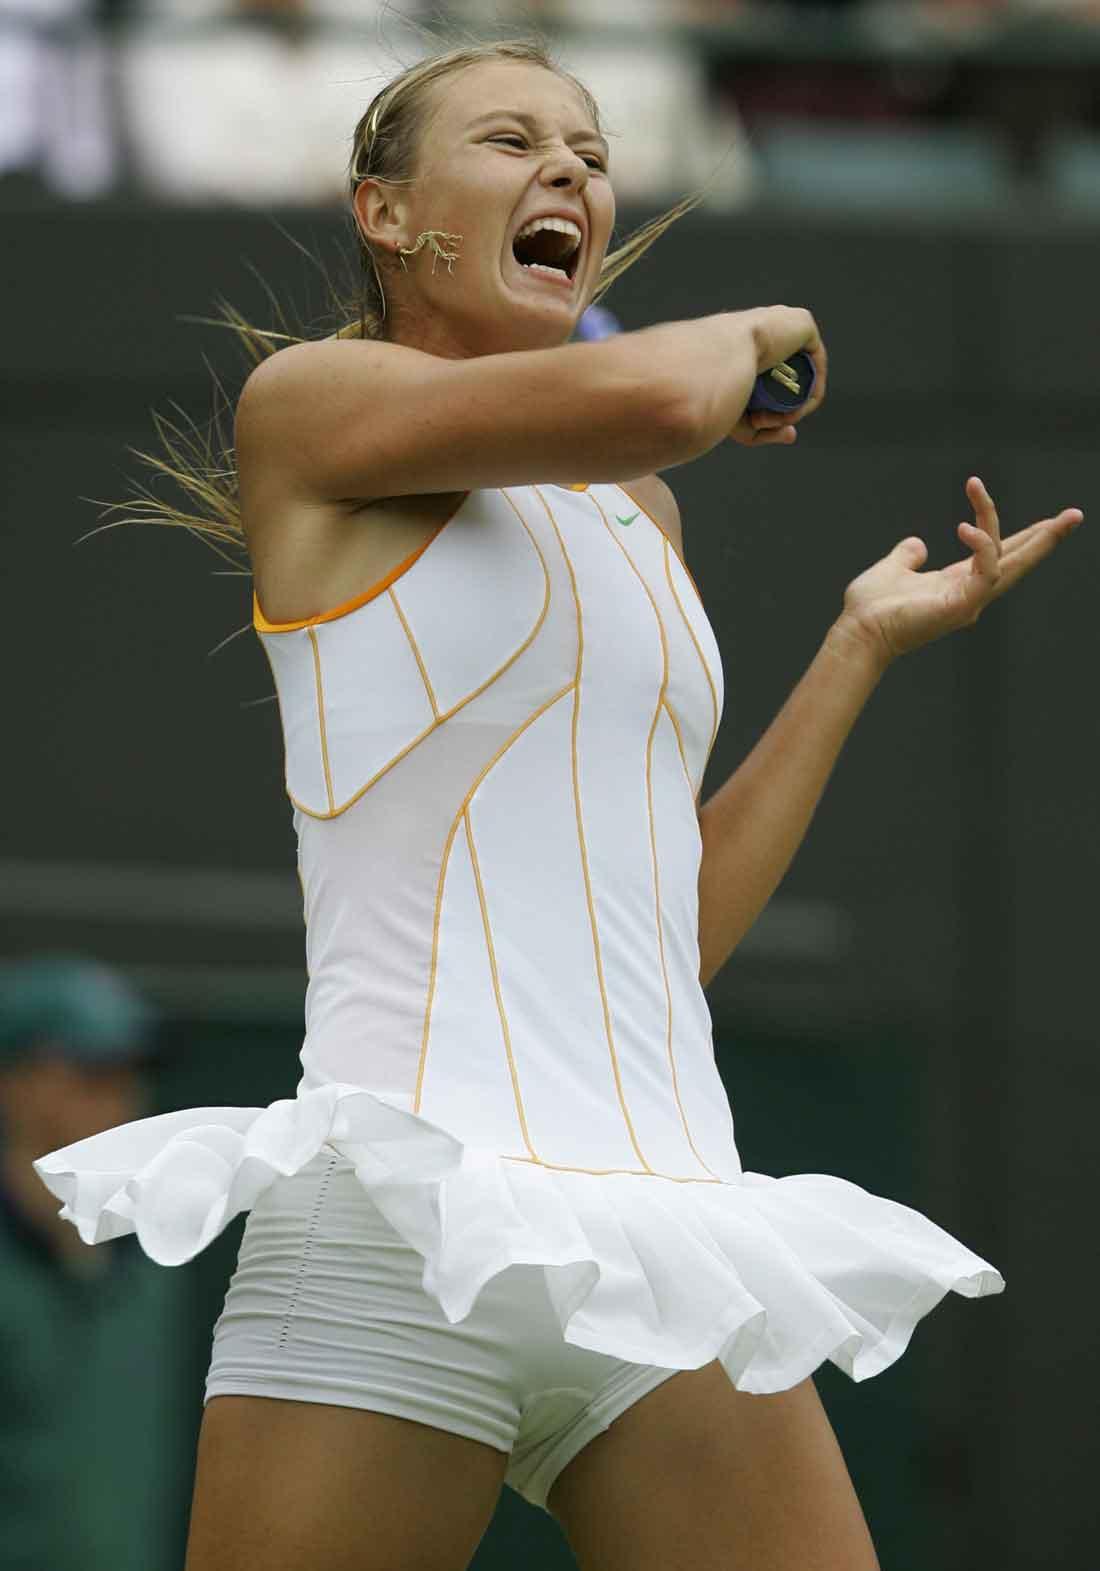 So? Tennis maria sharapova panties that